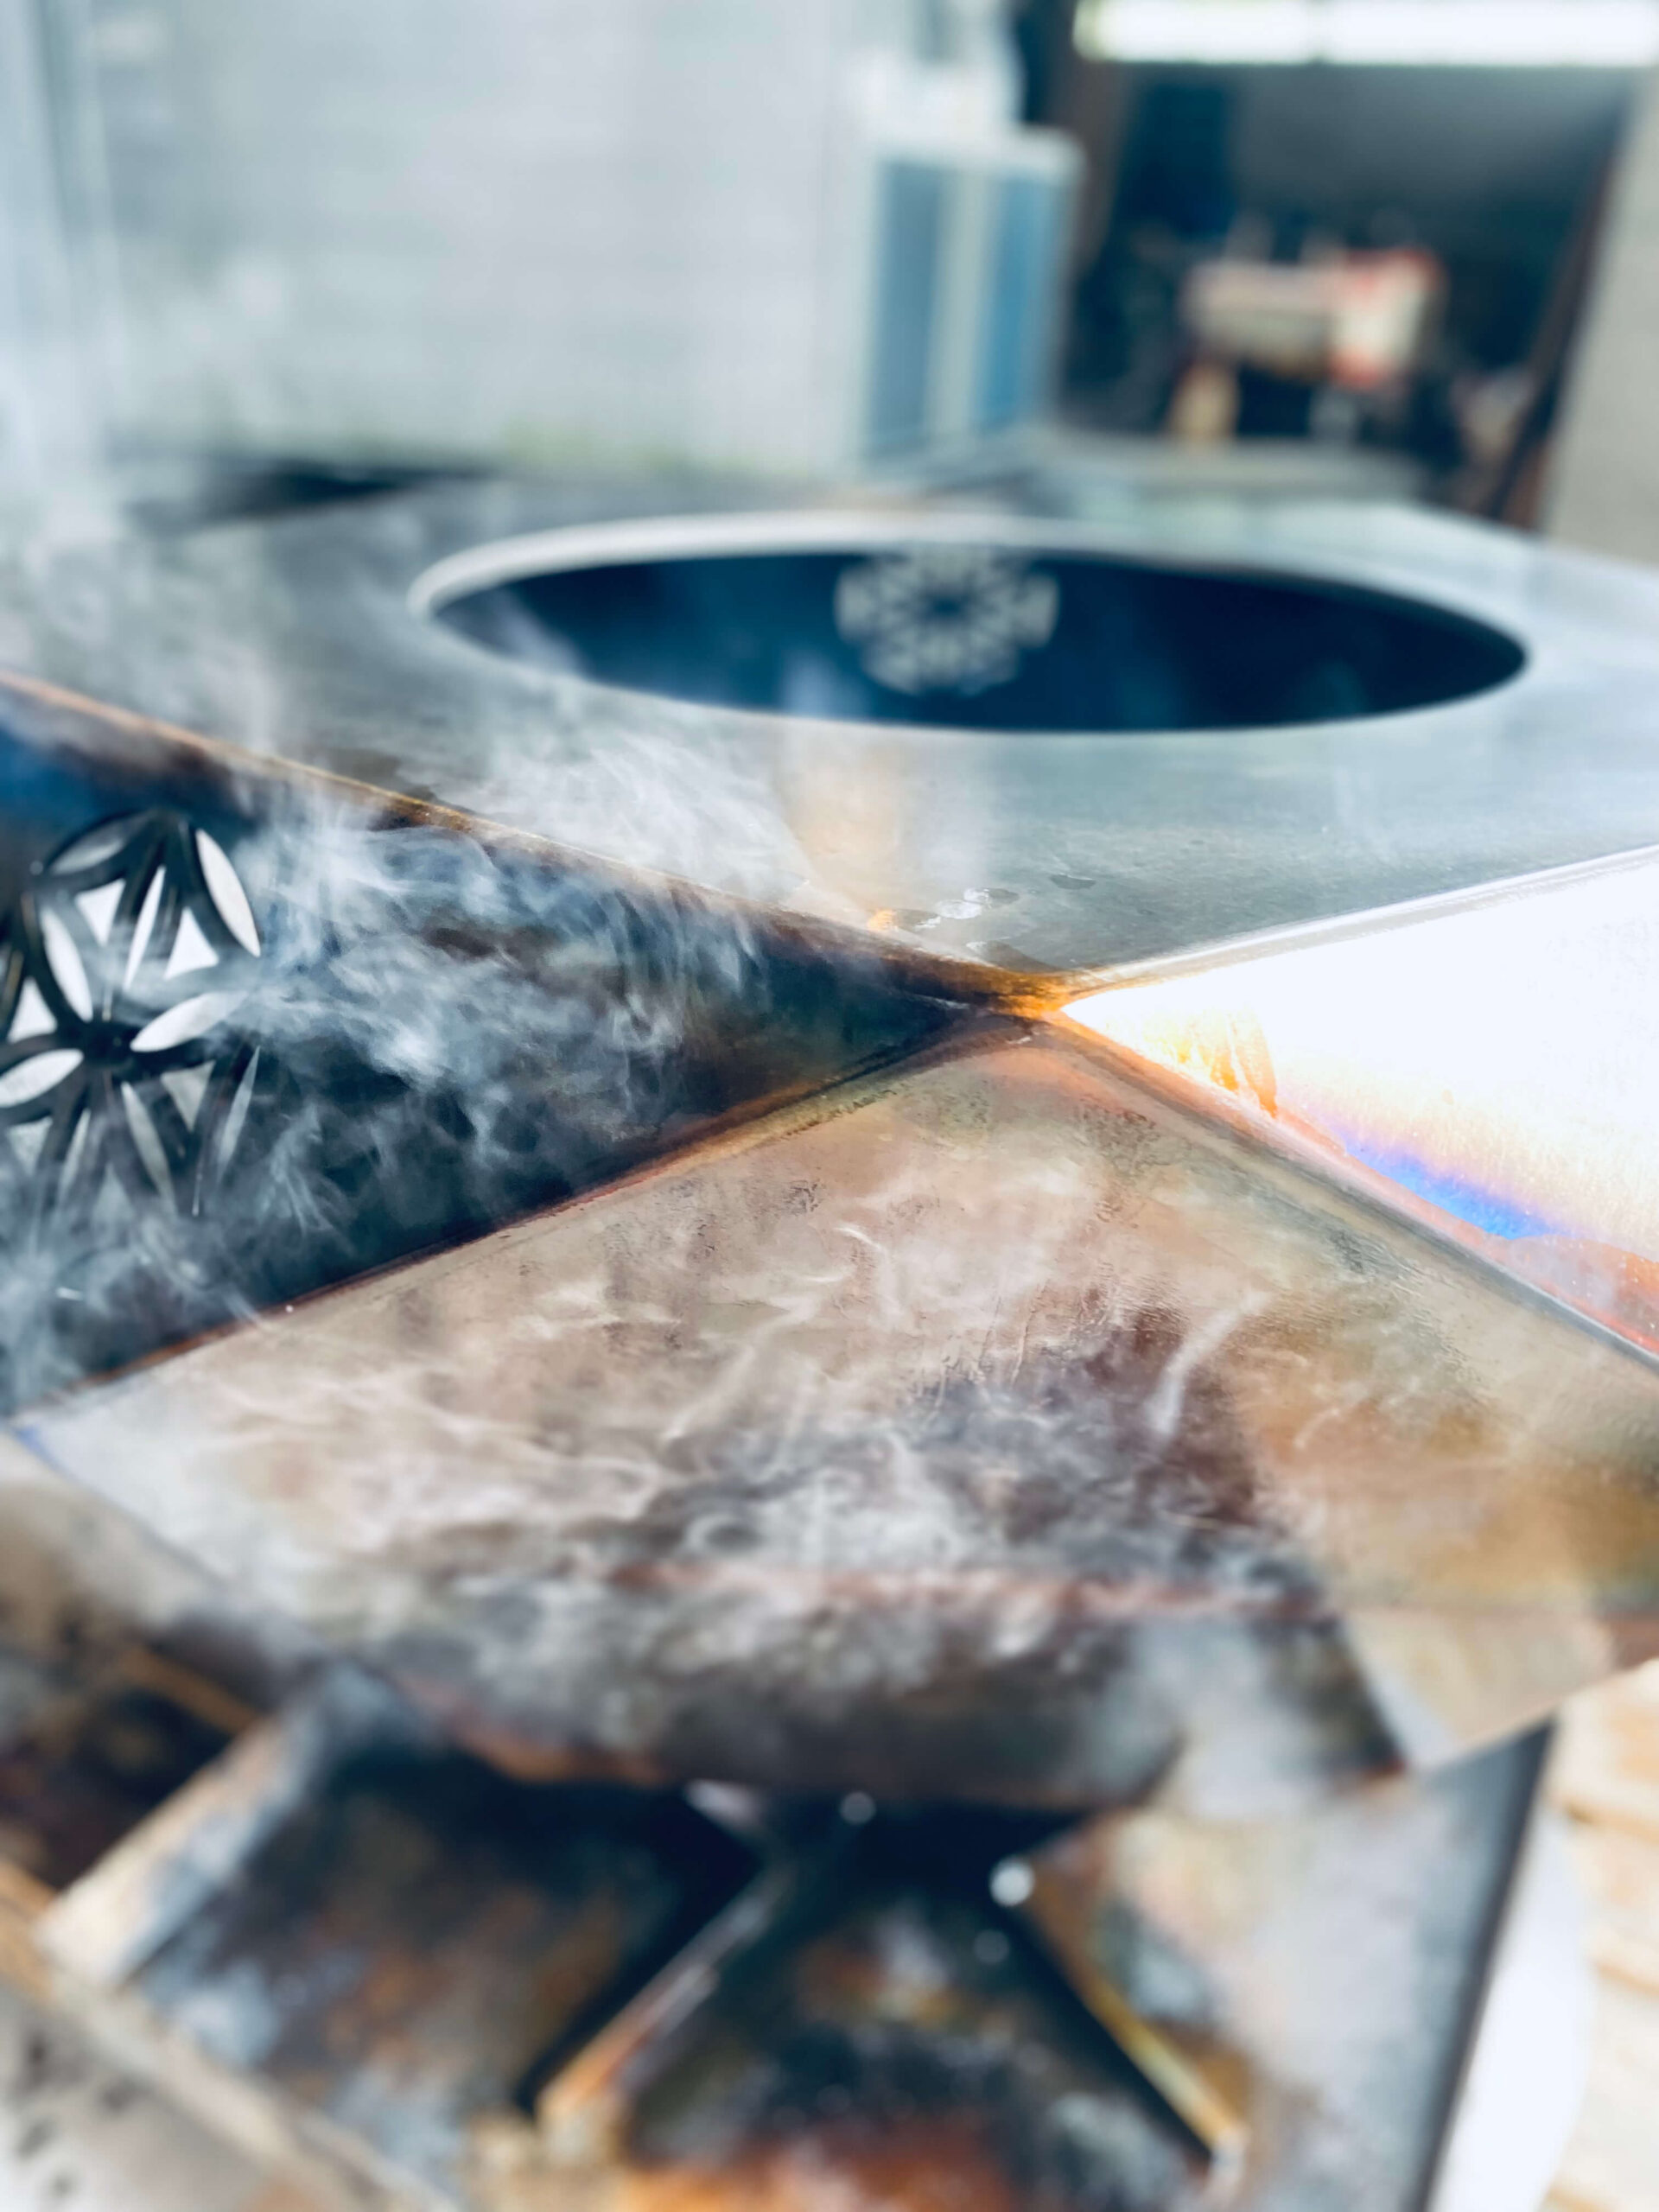 STAHL ATELIER – Magische Momente am offenen Feuer.